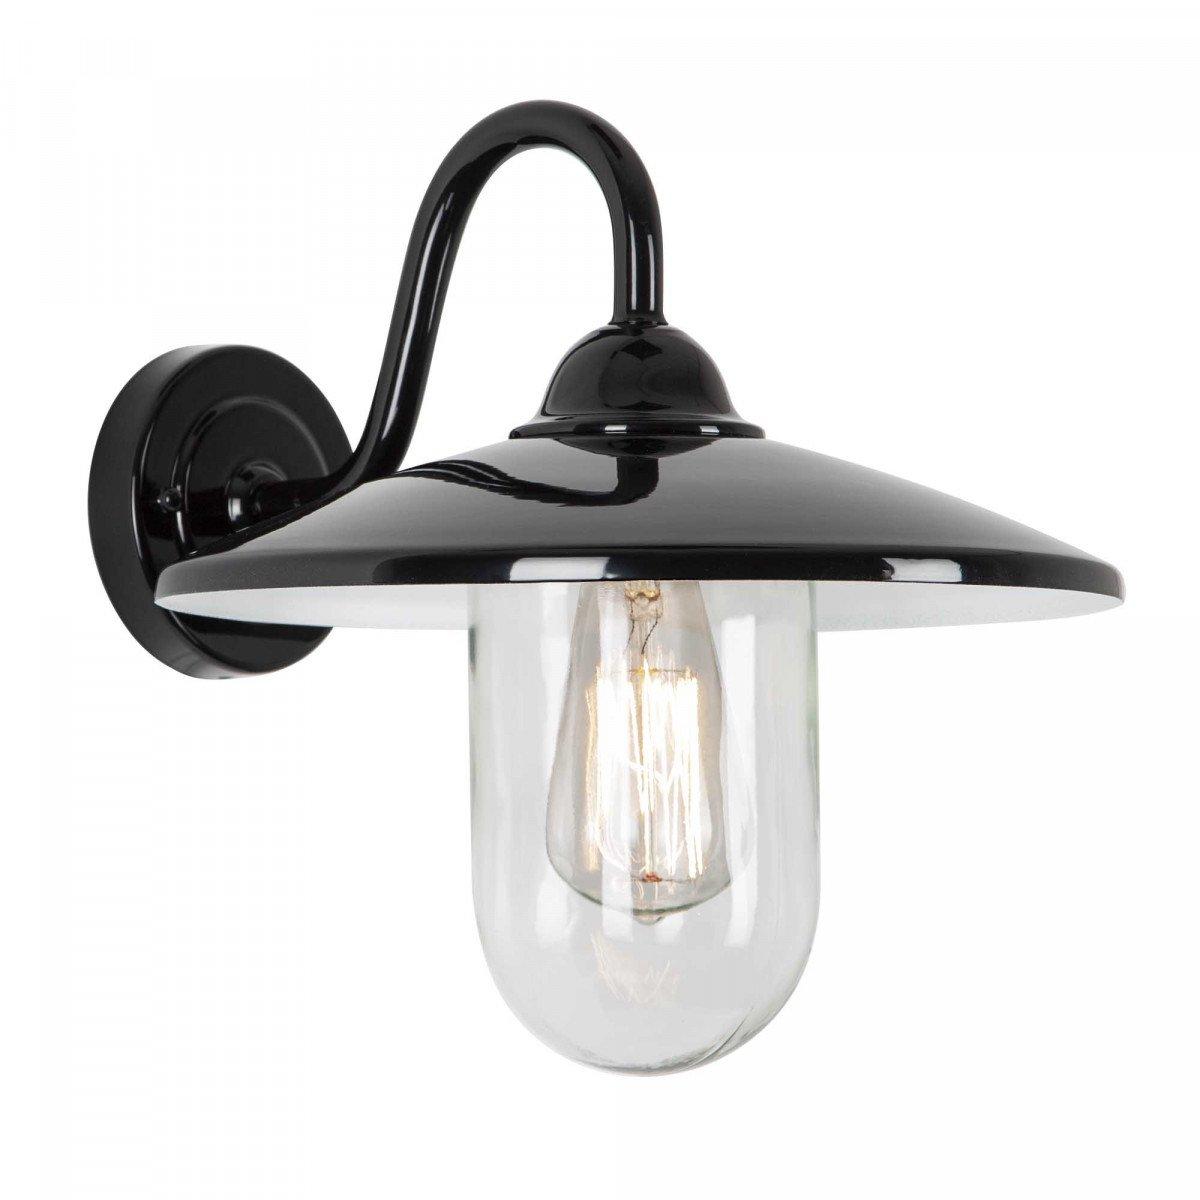 Buitenlamp brig zwart Dag Nacht sensor LED Schemersensor